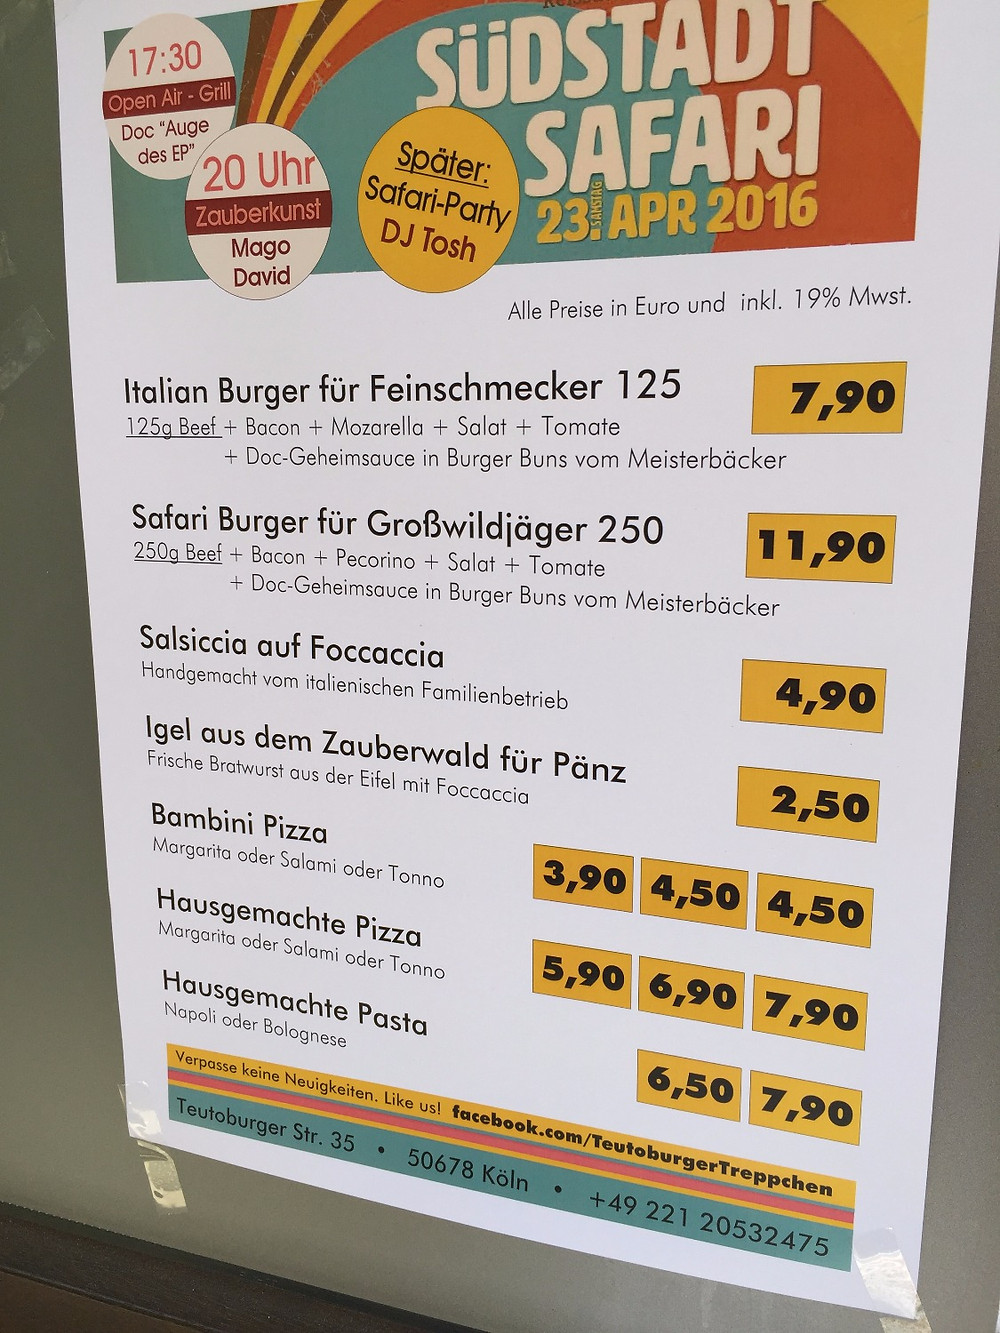 Teutoburger Treppchen